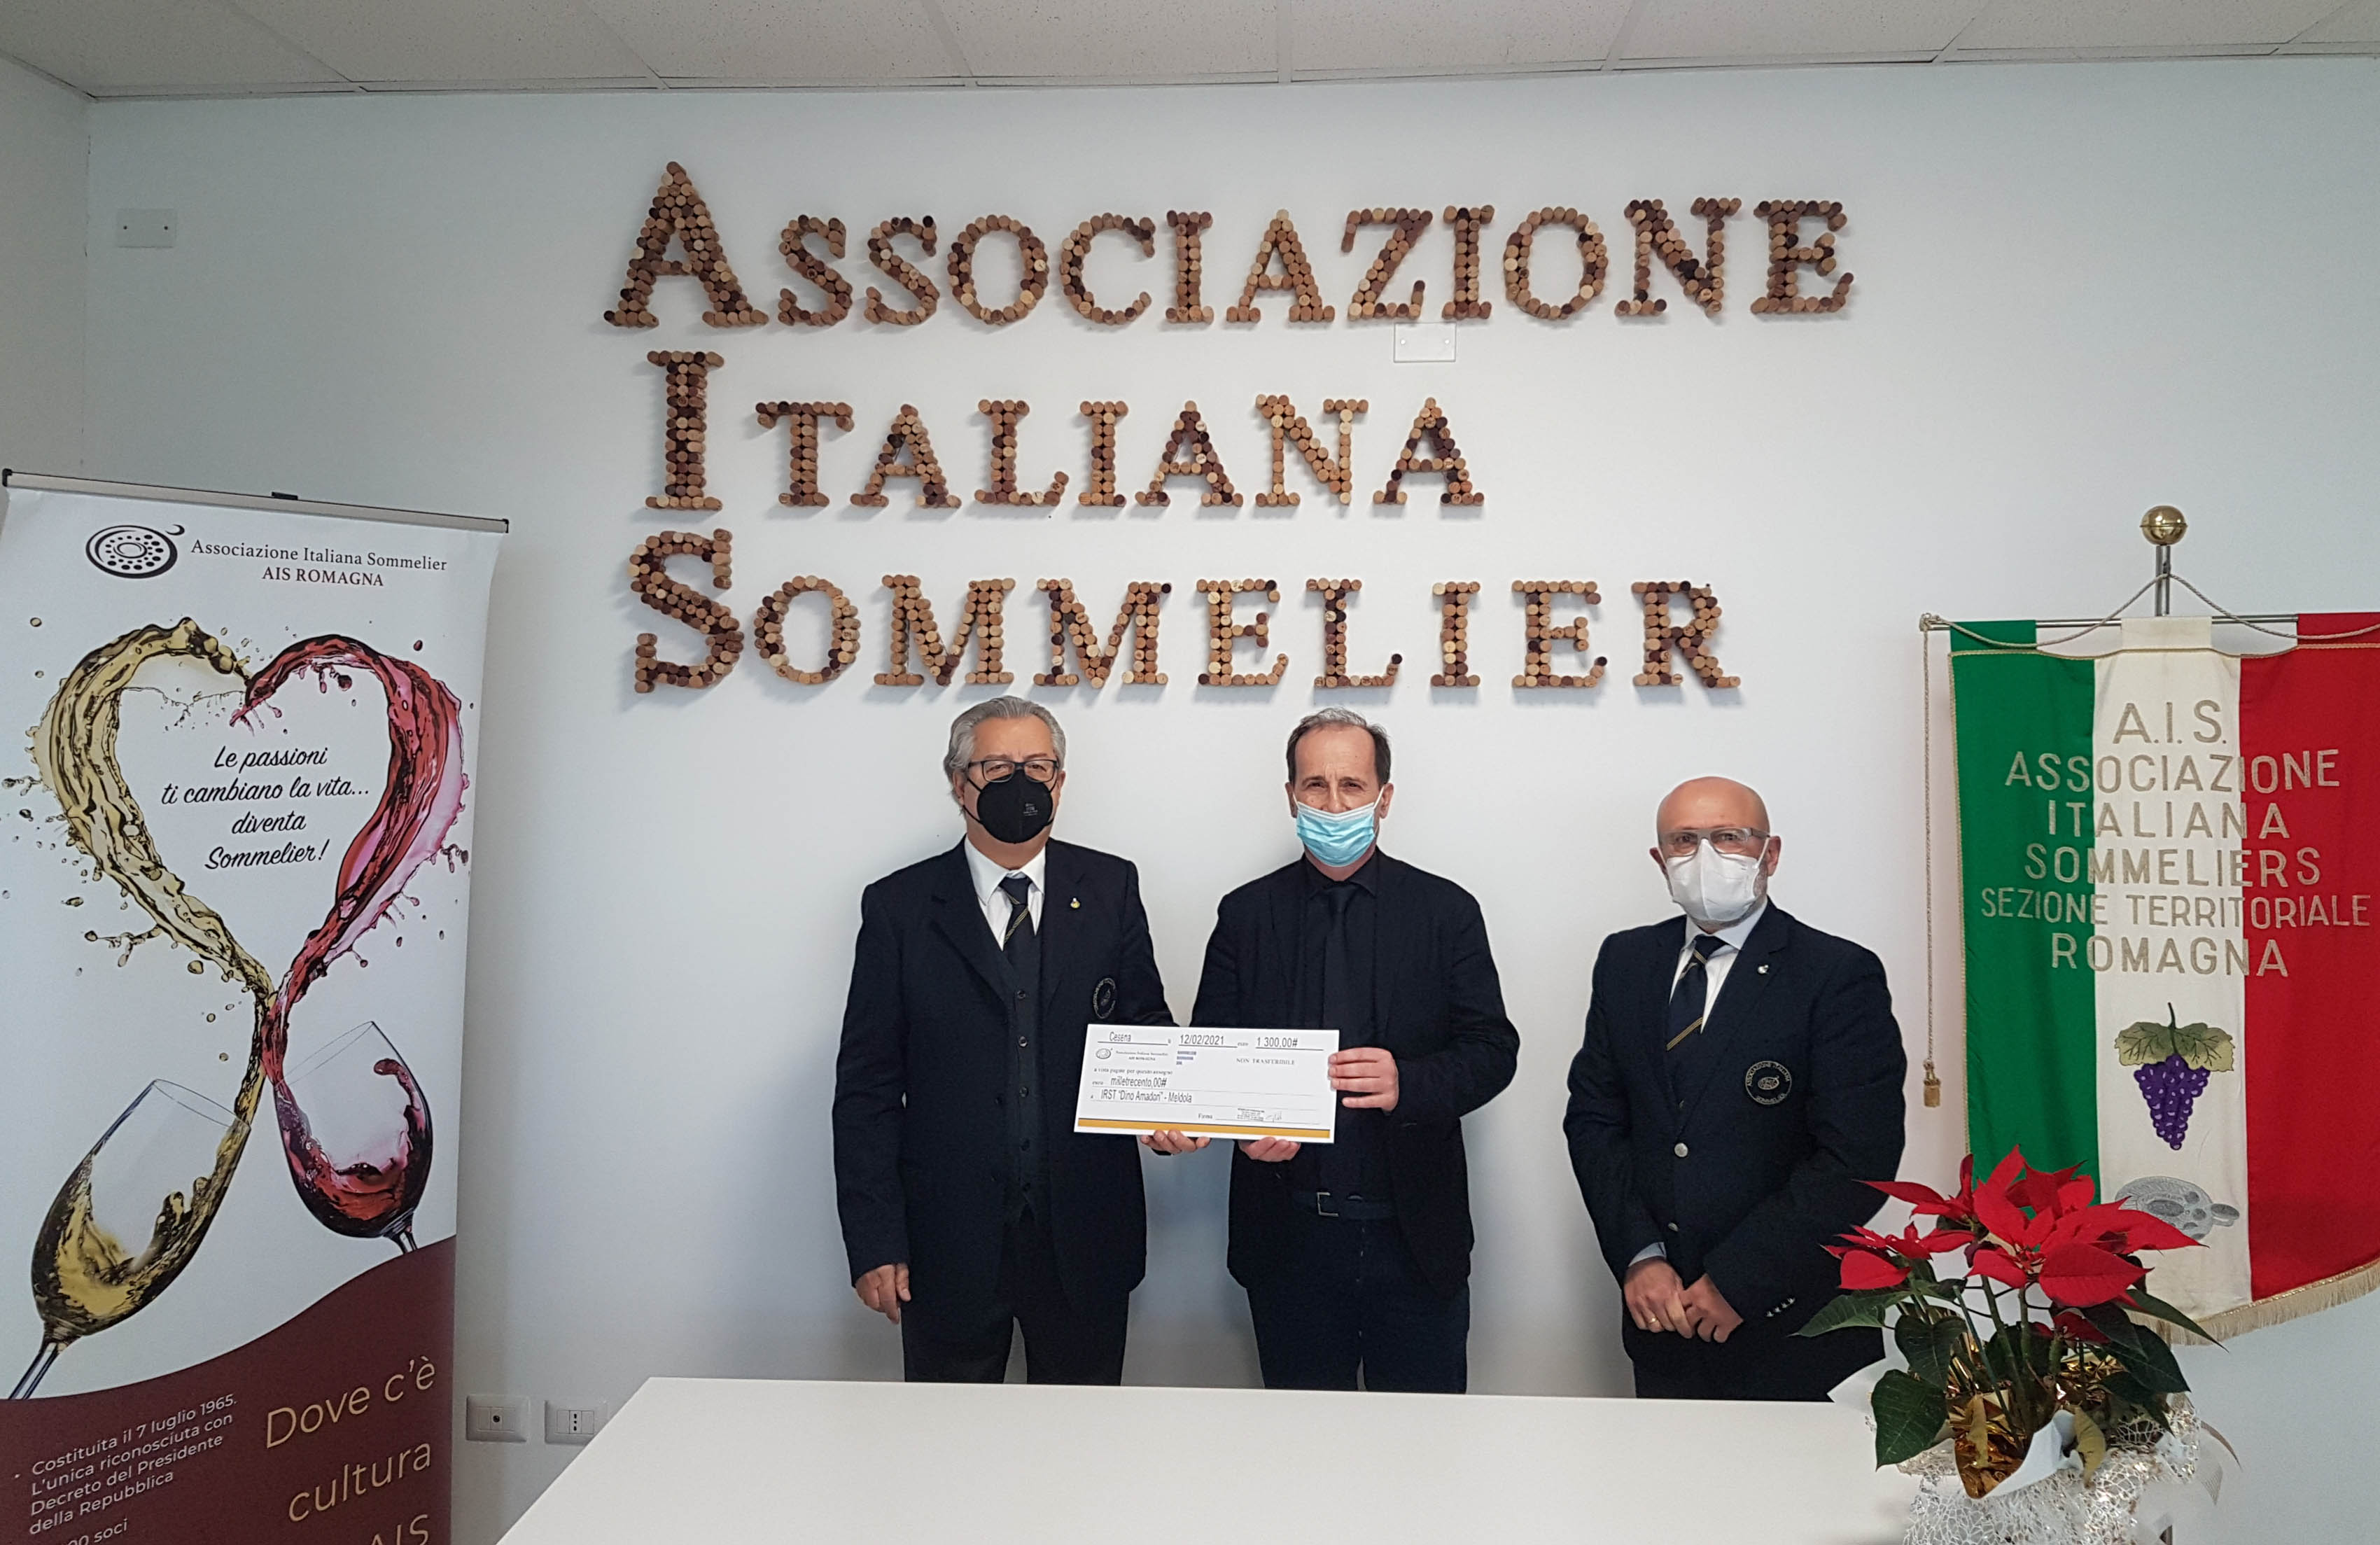 Consegna-assegno-AIS-Associazione-Italiana-Sommelier